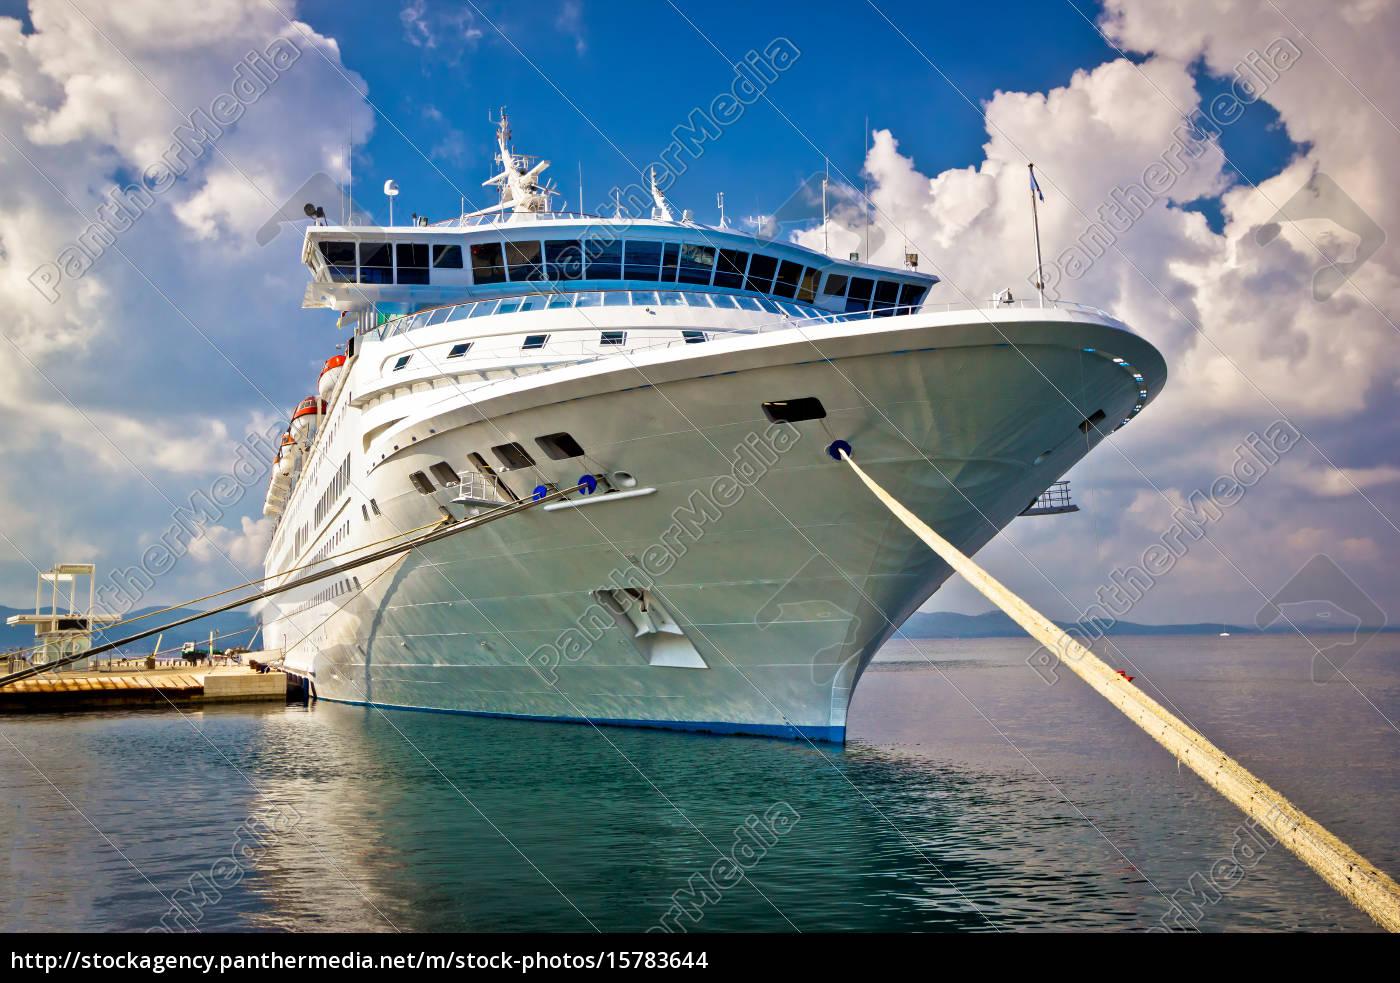 big, docked, cruise, ship, view - 15783644